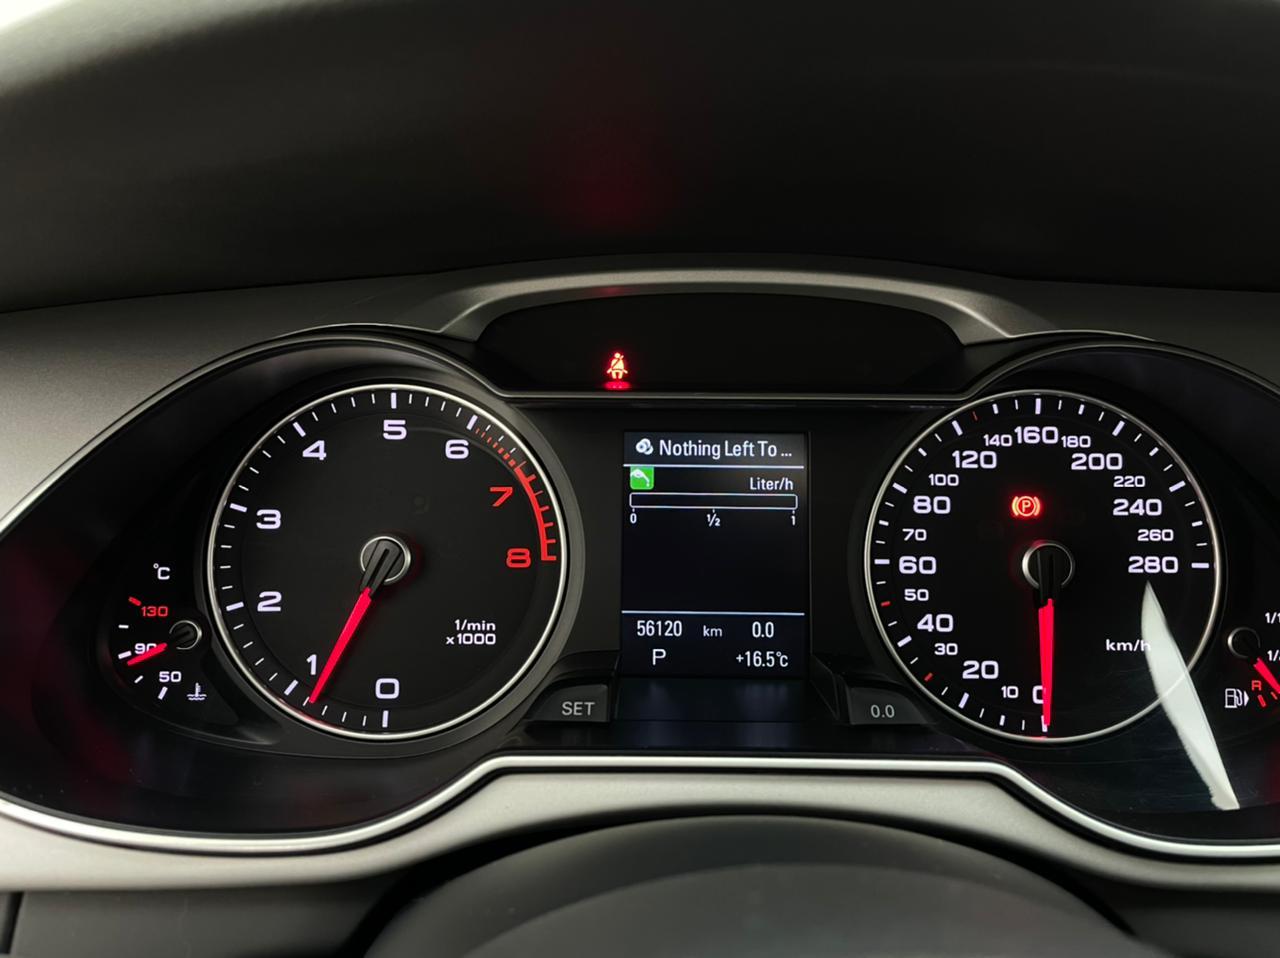 Audi-A4-A4 1.8 Tip./ Multitronic Turbo